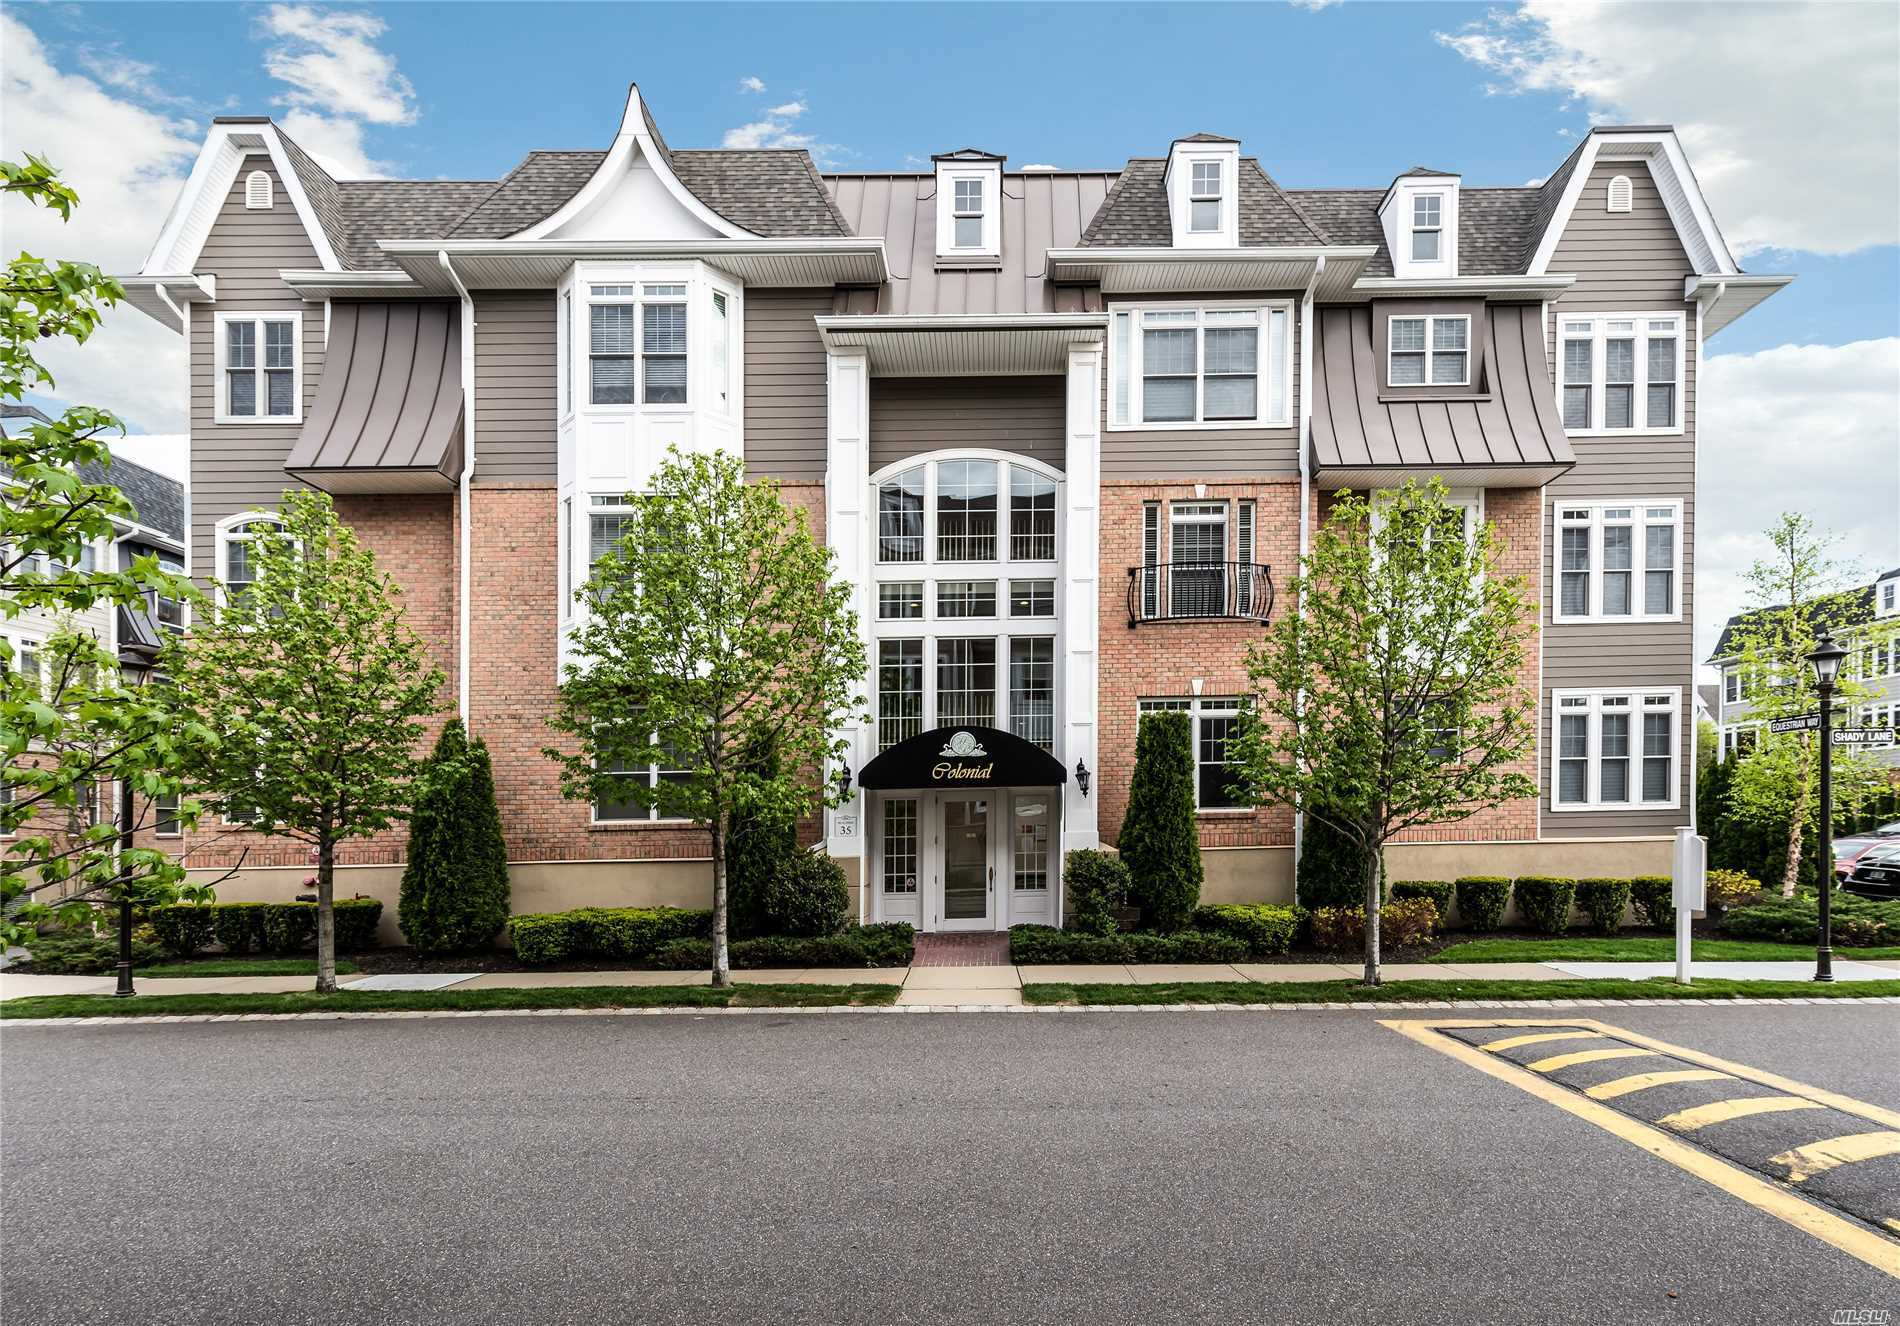 Property for sale at 88 Shady Lane, Westbury NY 11590, Westbury,  New York 11590